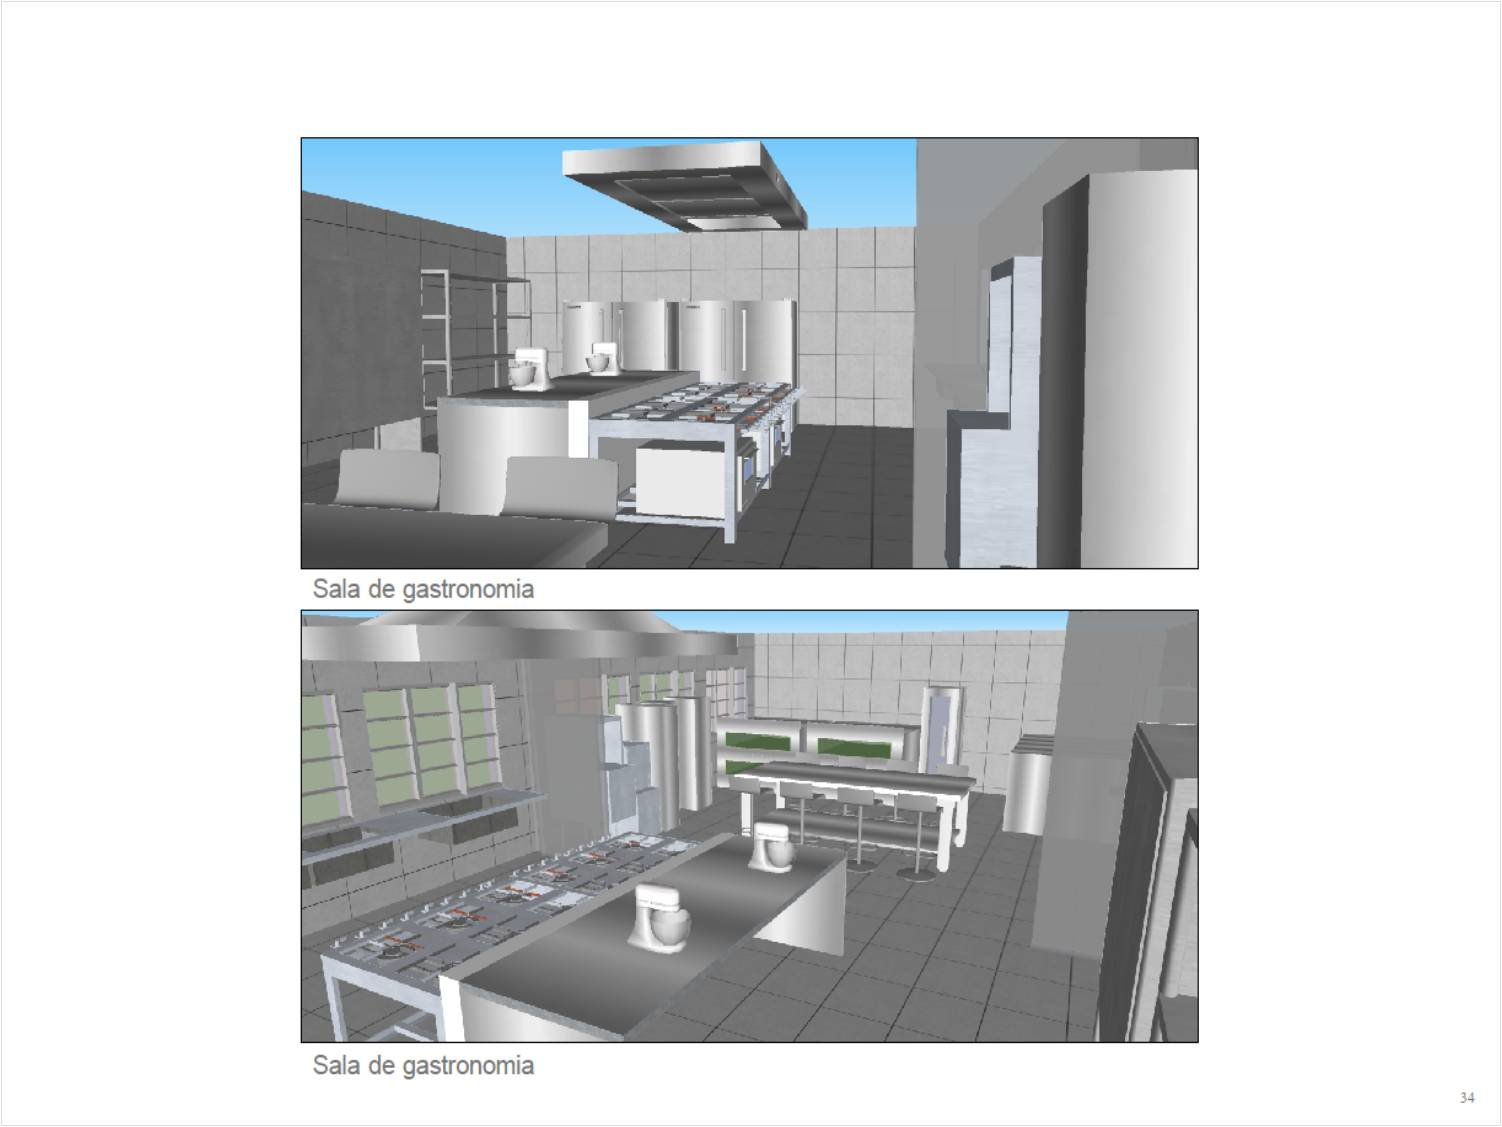 #167AB5 Arquivo da tag: cozinha industrial 1502x1127 px Projeto De Arquitetura De Cozinha Industrial #2759 imagens